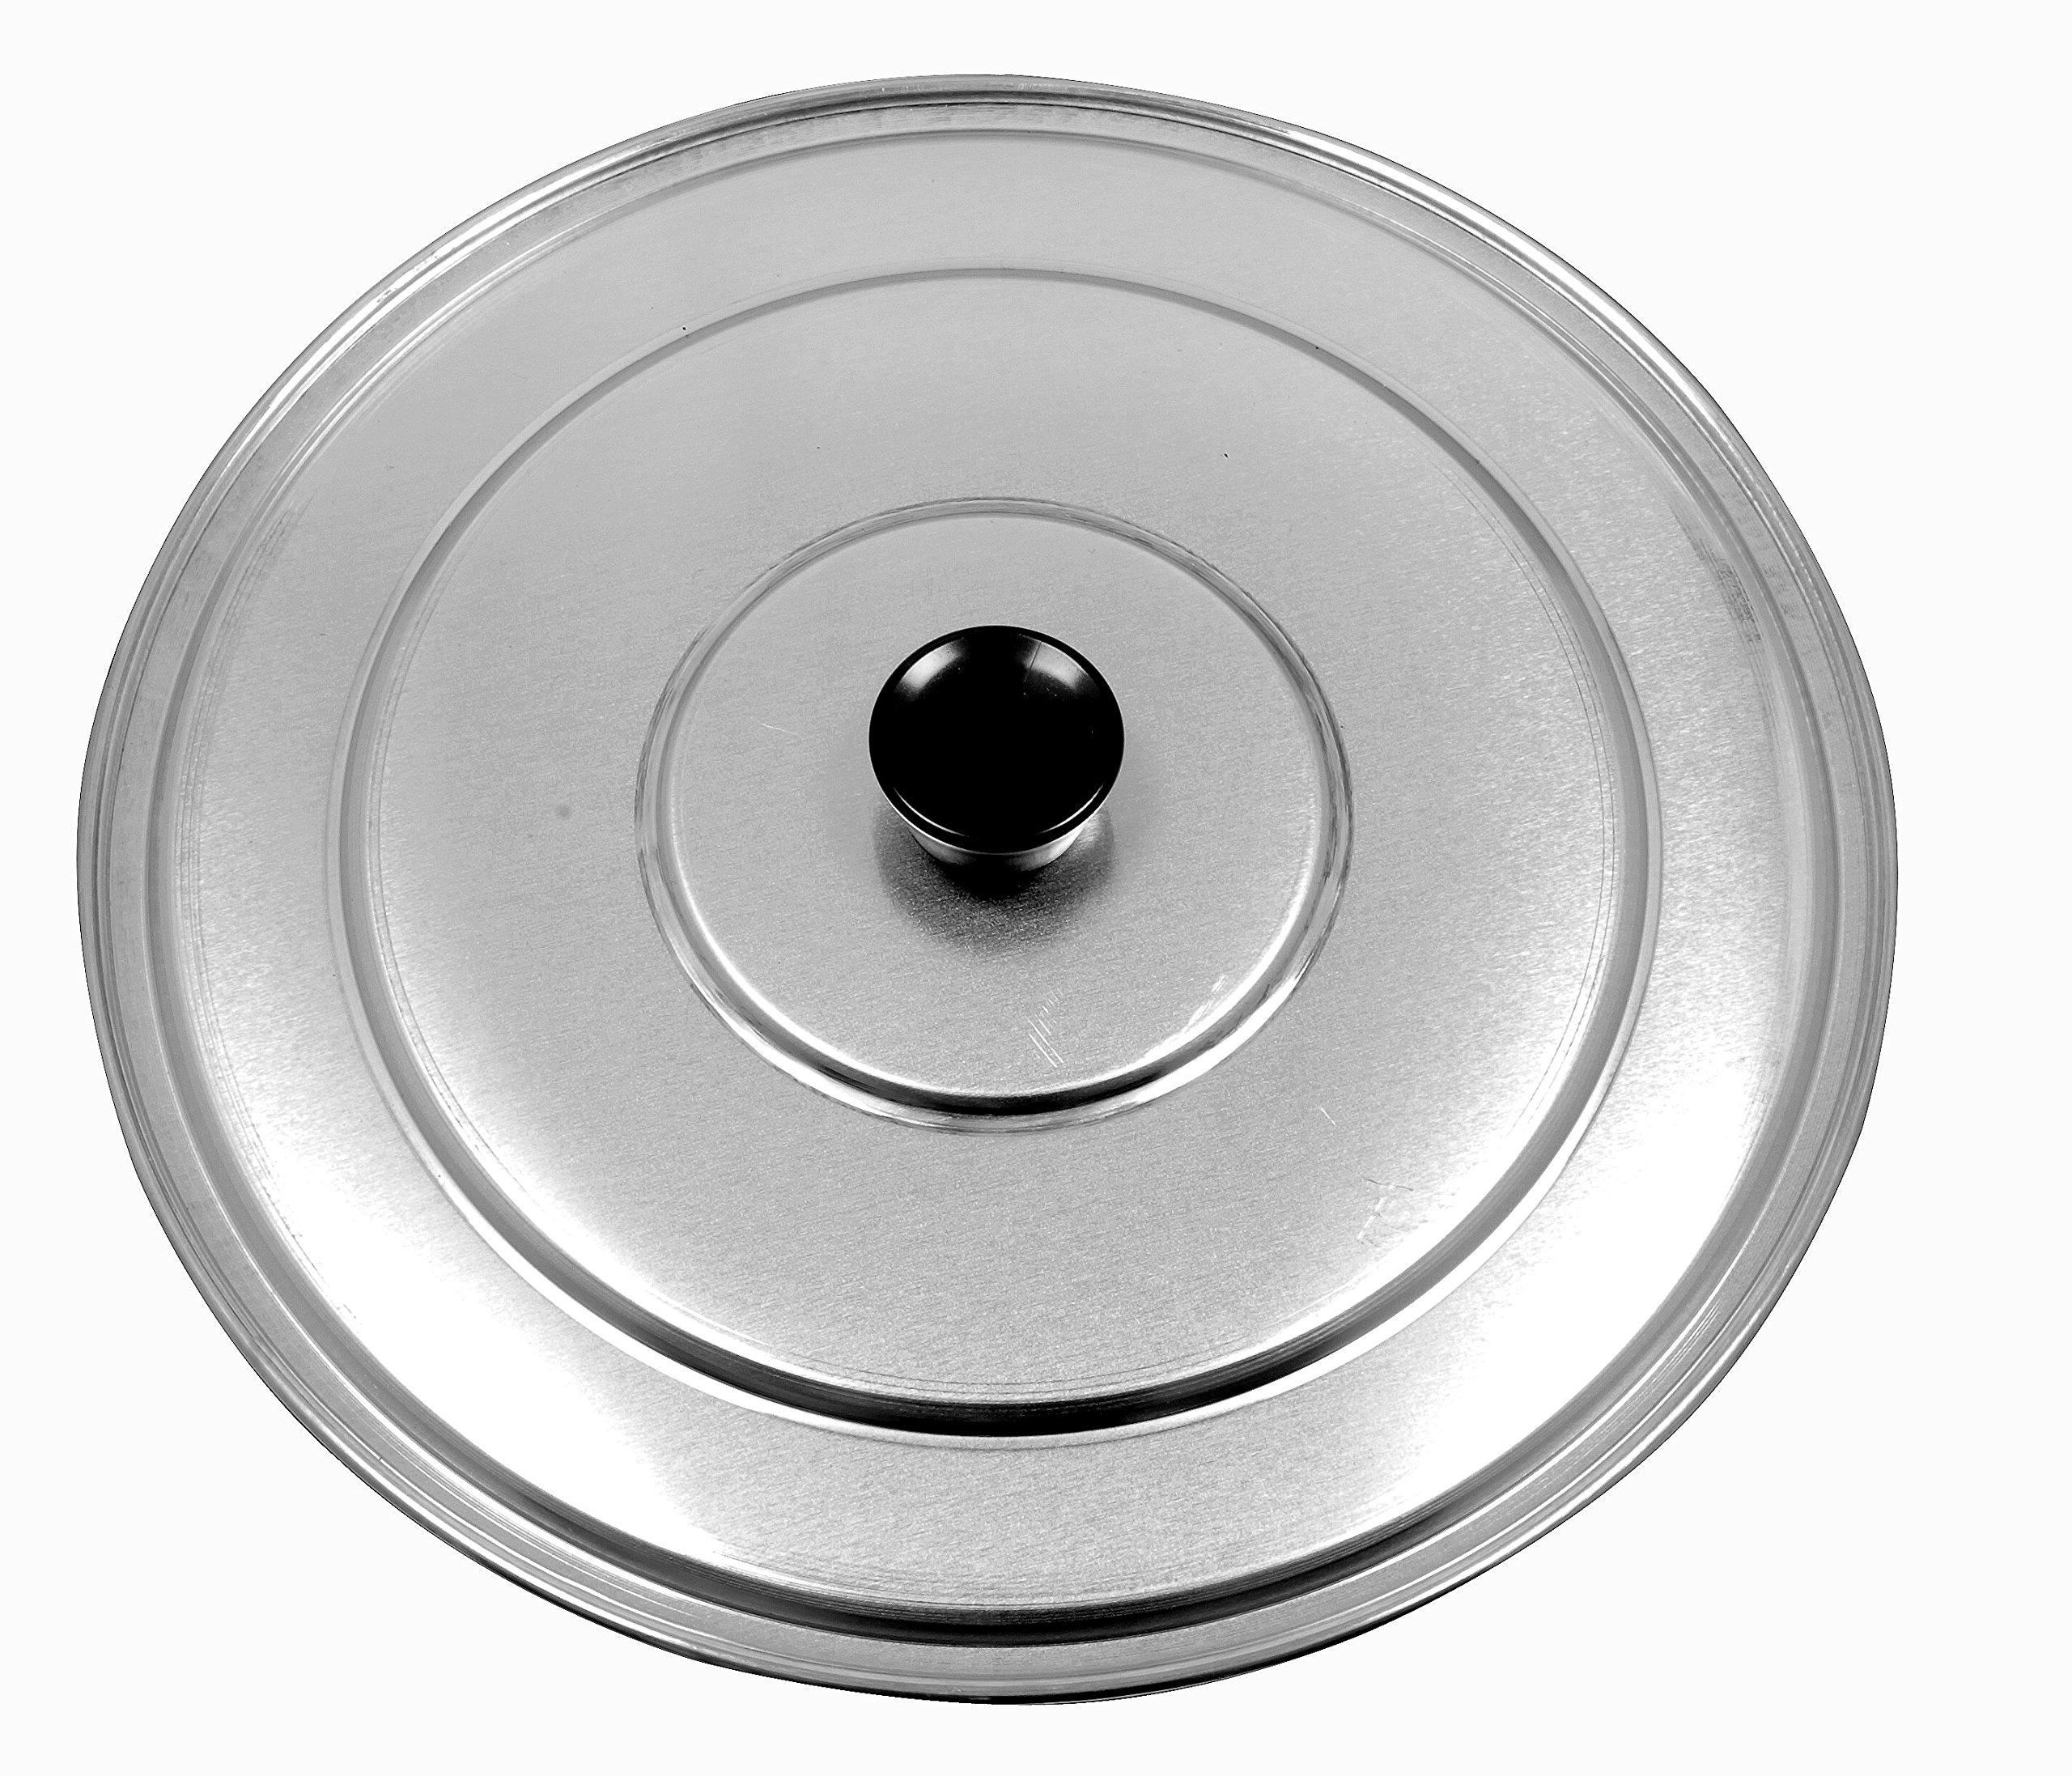 Paderno World Cuisine A4982190 Aluminum Paella Pan Lid, 19-5/8-Inch, Gray